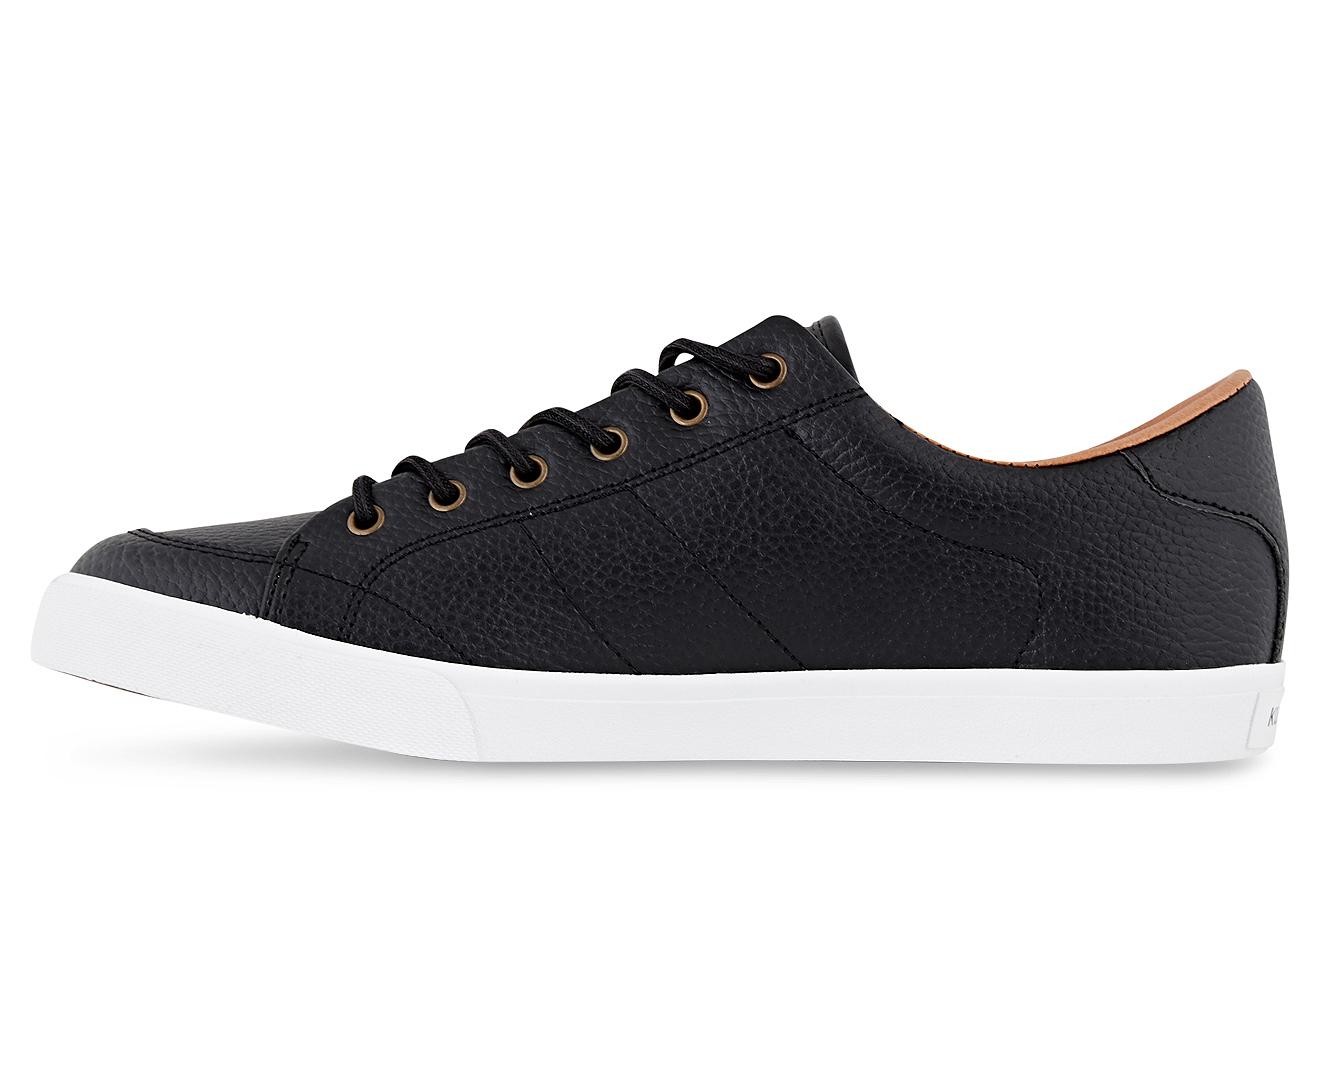 Kustom Kramer Black Leather Shoes